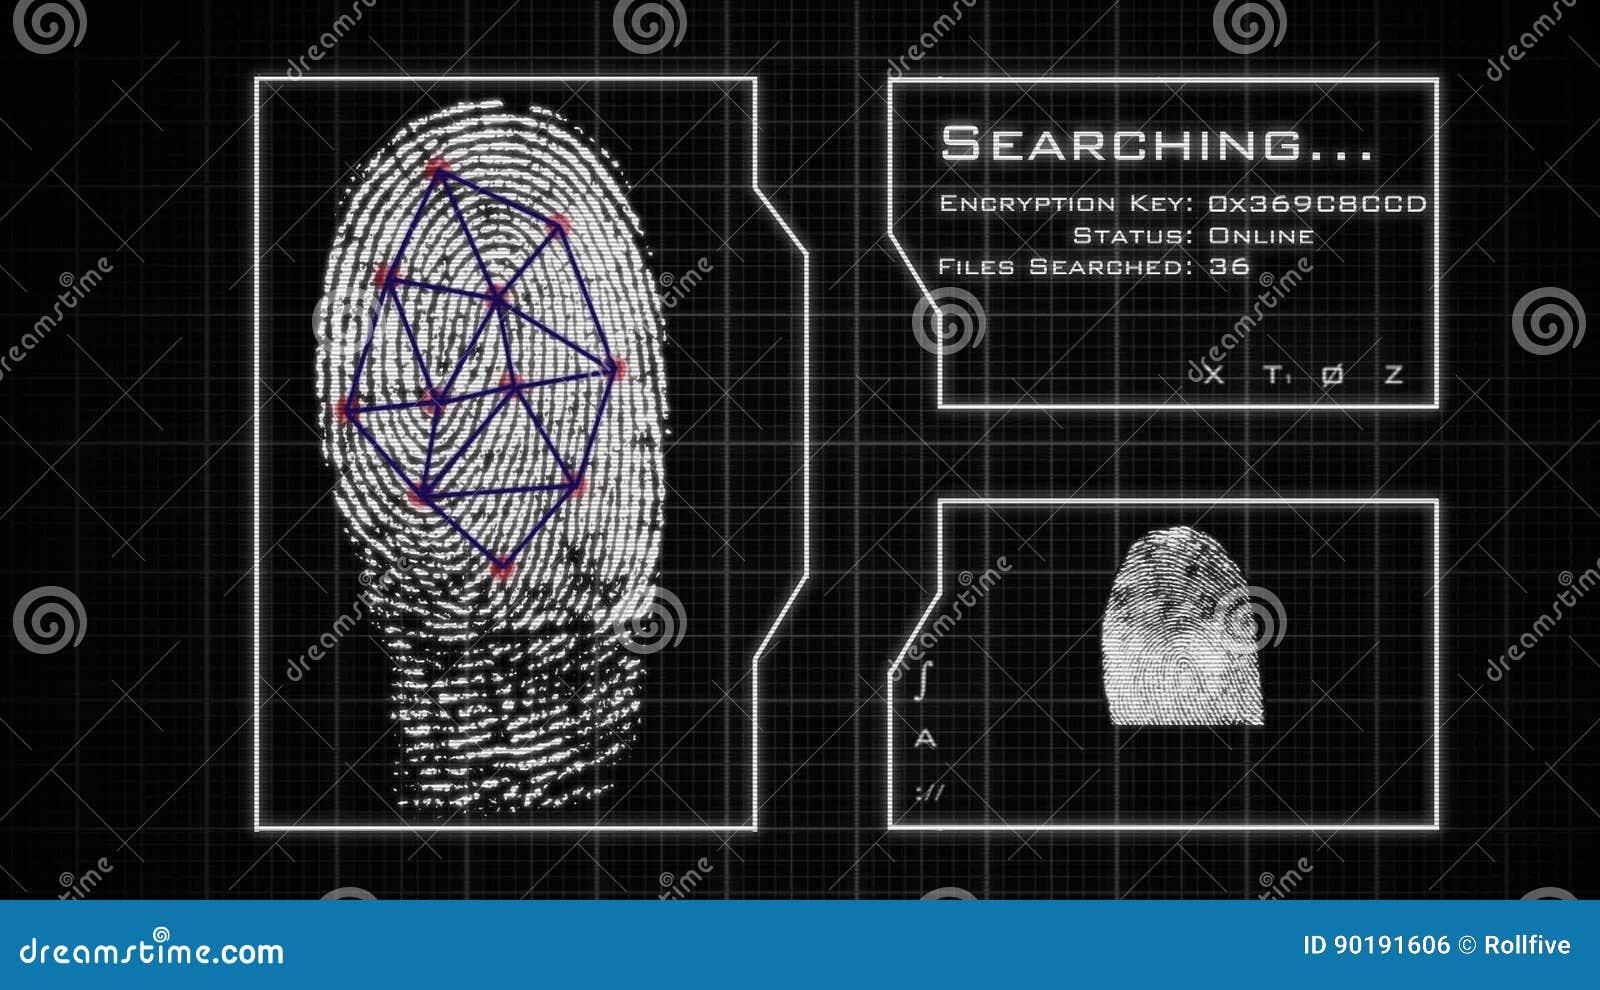 Fingerprint images database examples | download scientific diagram.